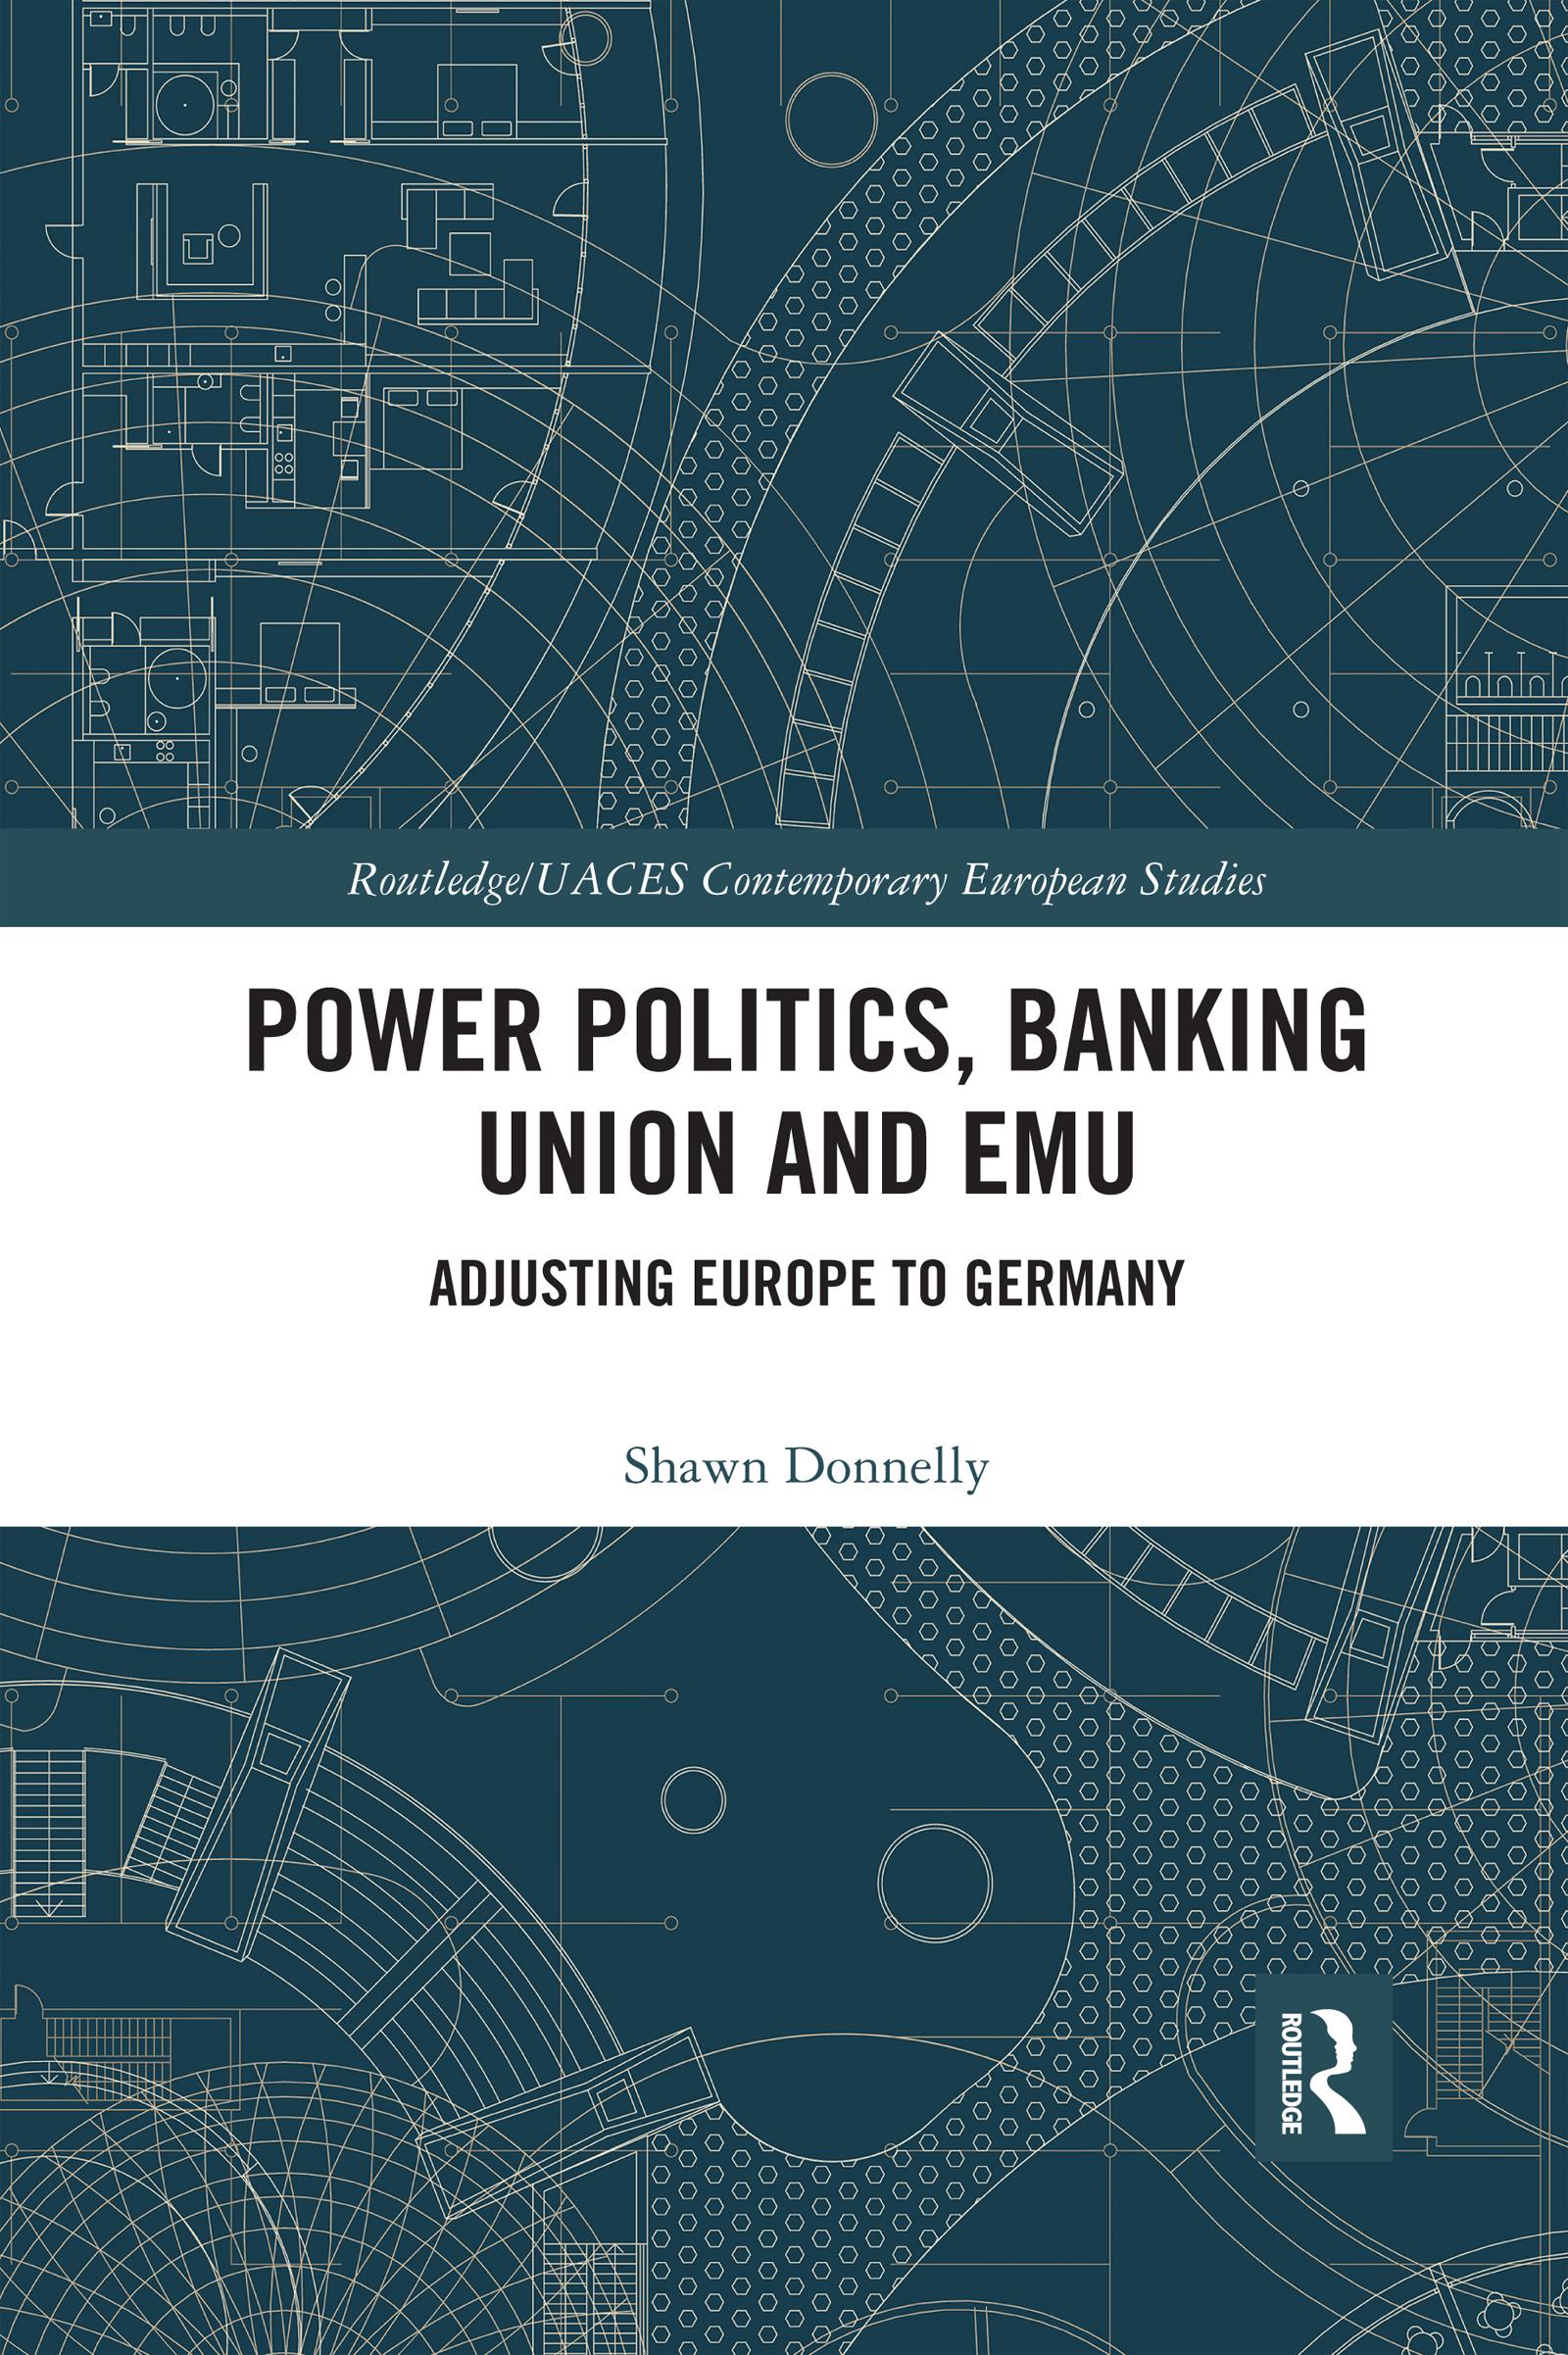 Power Politics, Banking Union and EMU